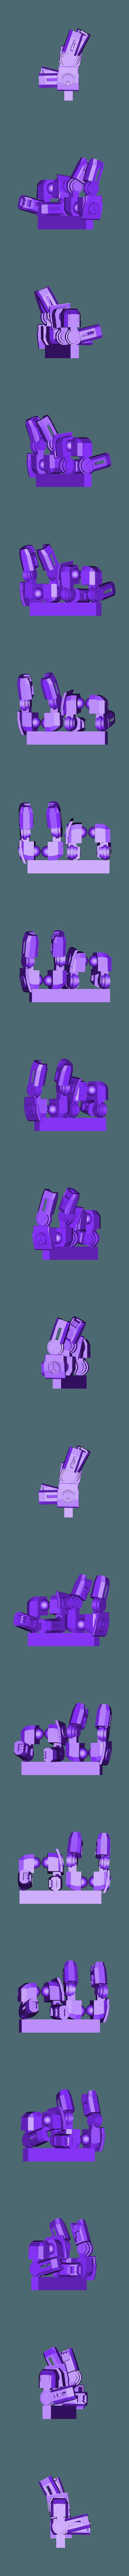 Arms.obj Download free OBJ file Bikini Pilot Battle Suit • Object to 3D print, Leesedrenfort